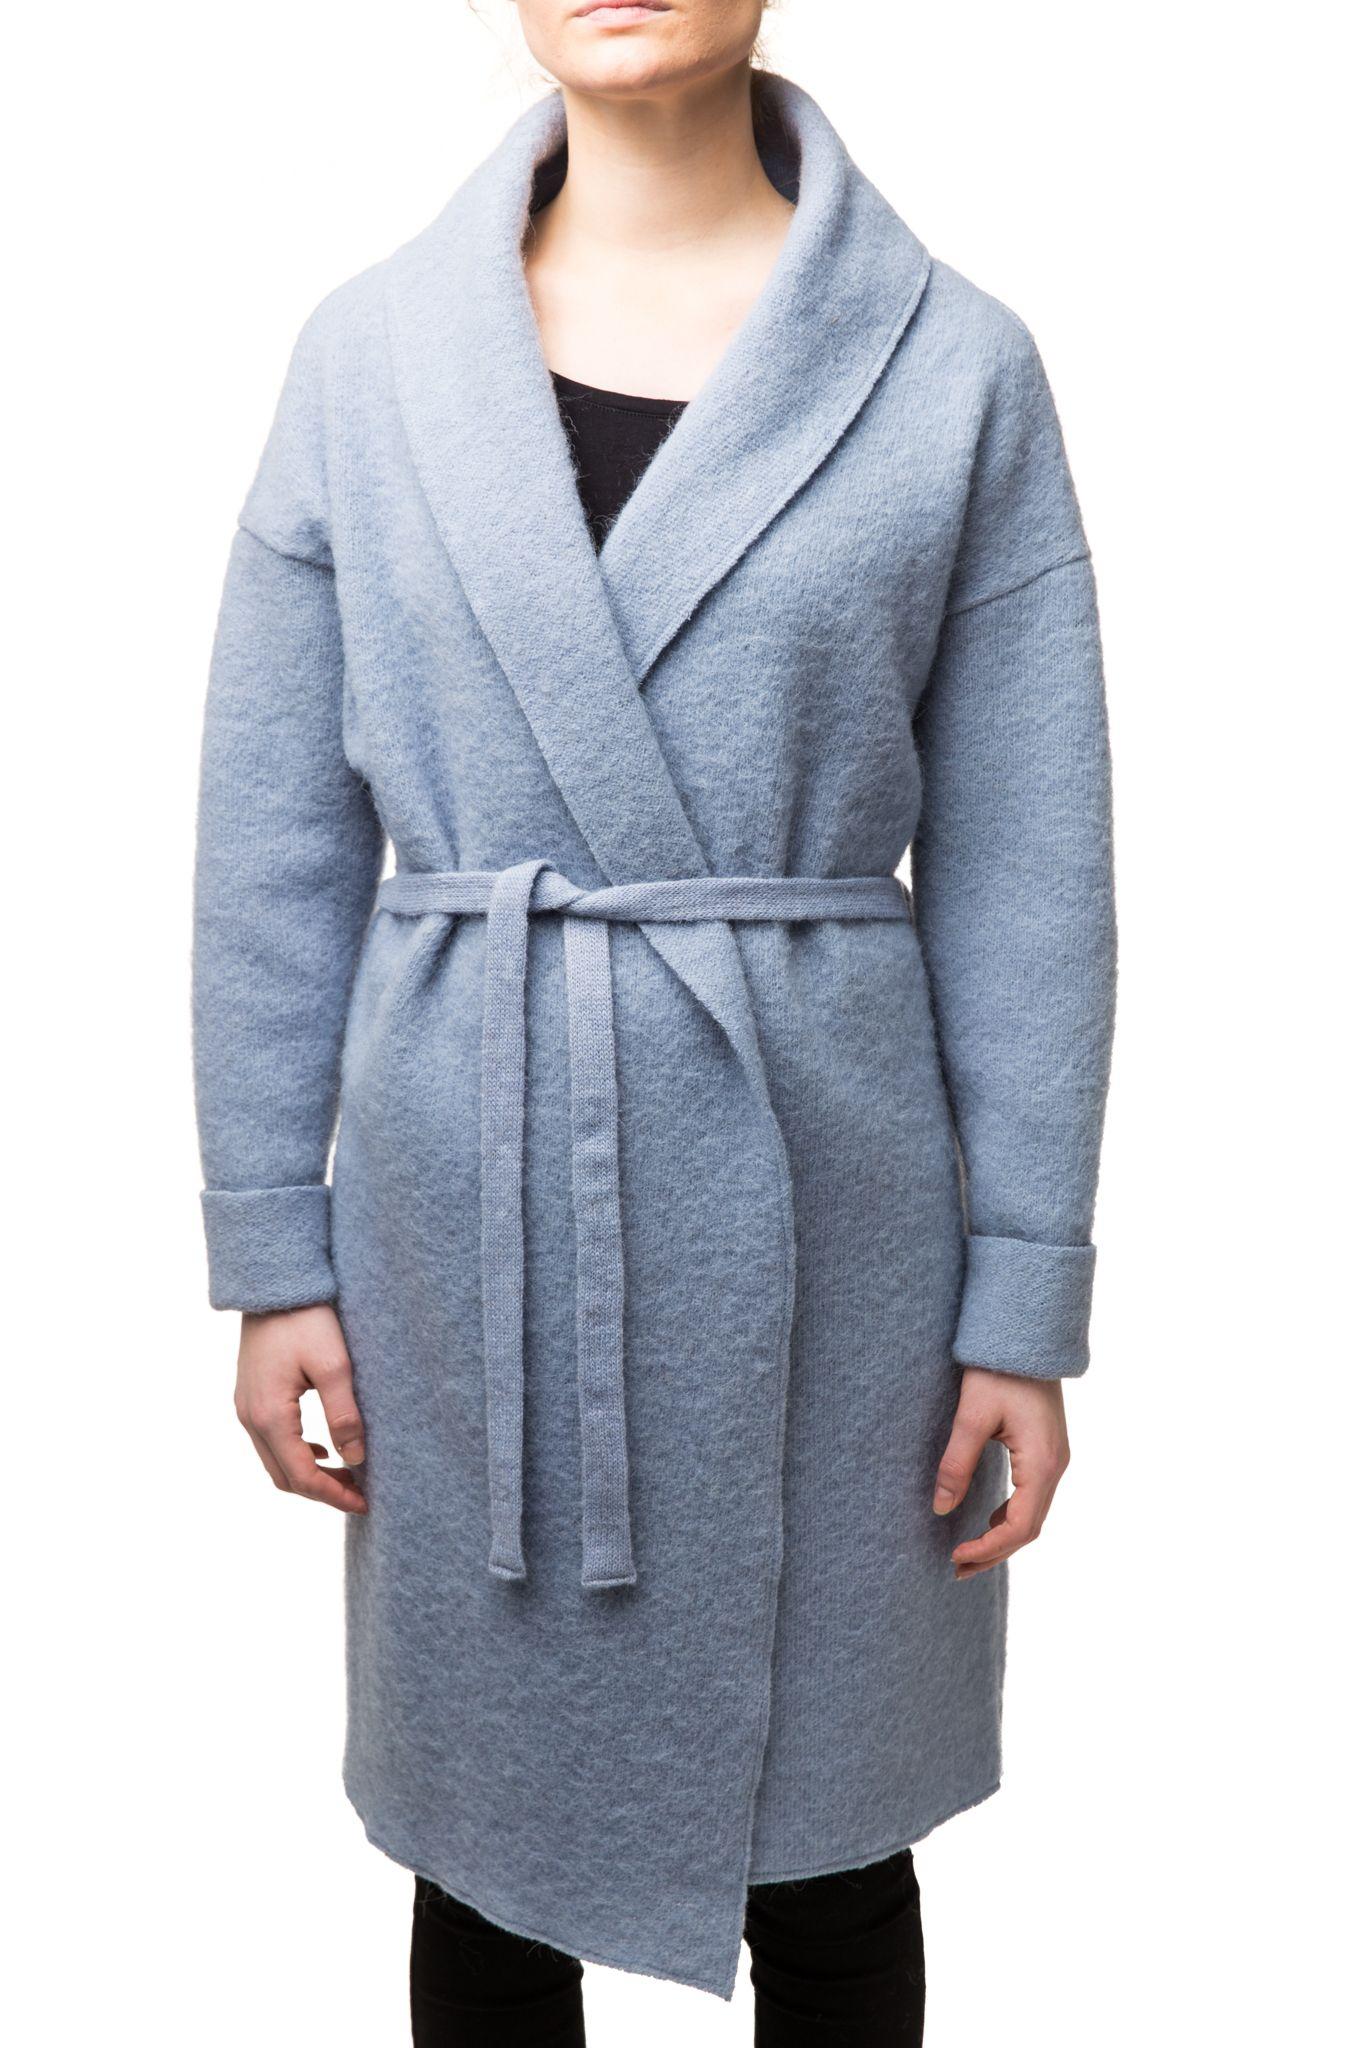 blauer damen woll mantel langmantel schurwolle varma st ssa ebay. Black Bedroom Furniture Sets. Home Design Ideas